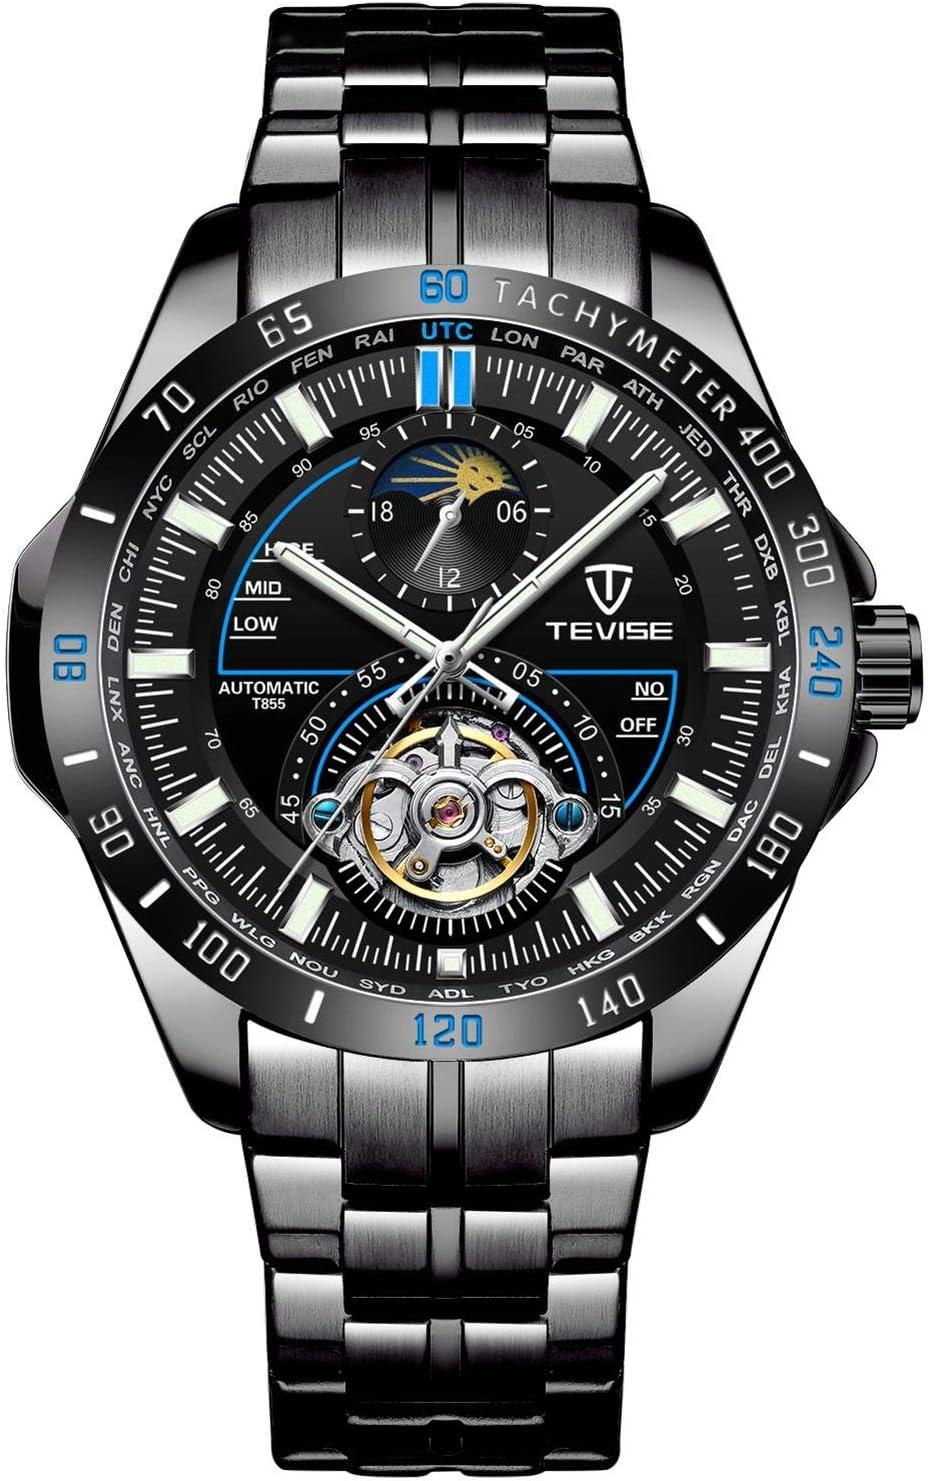 JTTM Relojes Hombre Moda Acero Inoxidable Impermeables Mecánico Automático Reloj Hombre Lujoso Comercio Calendario Militar Deportivo Relojes Tourbillon